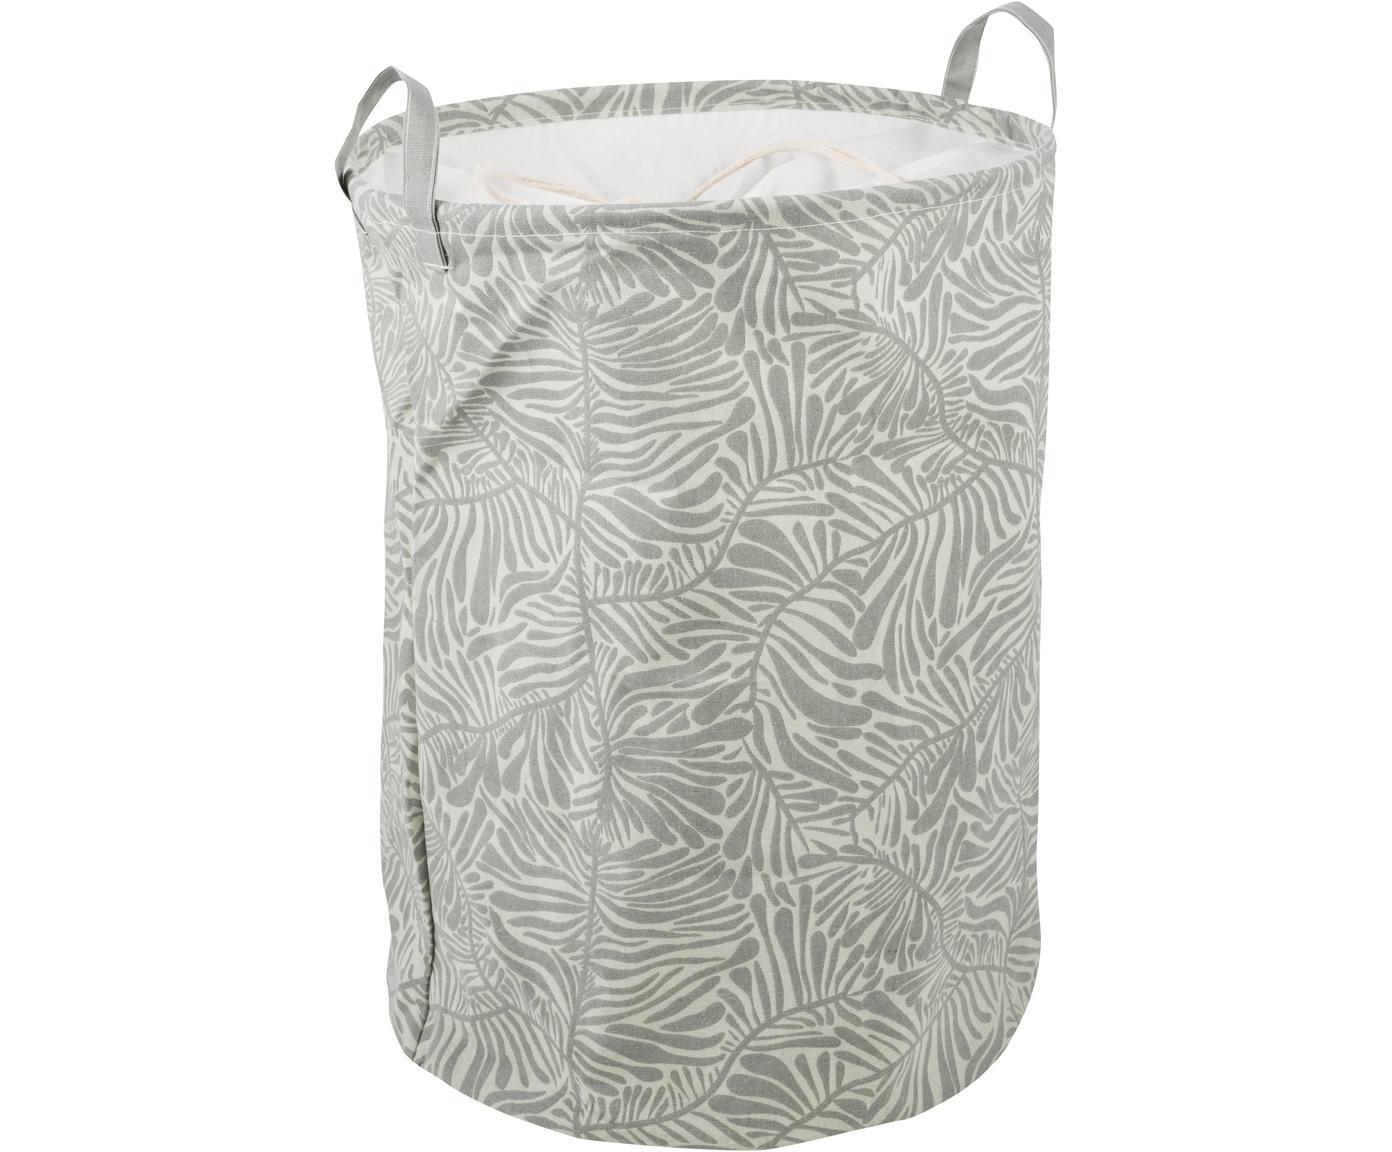 Cesta Corinne, 65%algodón, 35%poliéster, Blanco, verde claro, Ø 37 x Al 52 cm